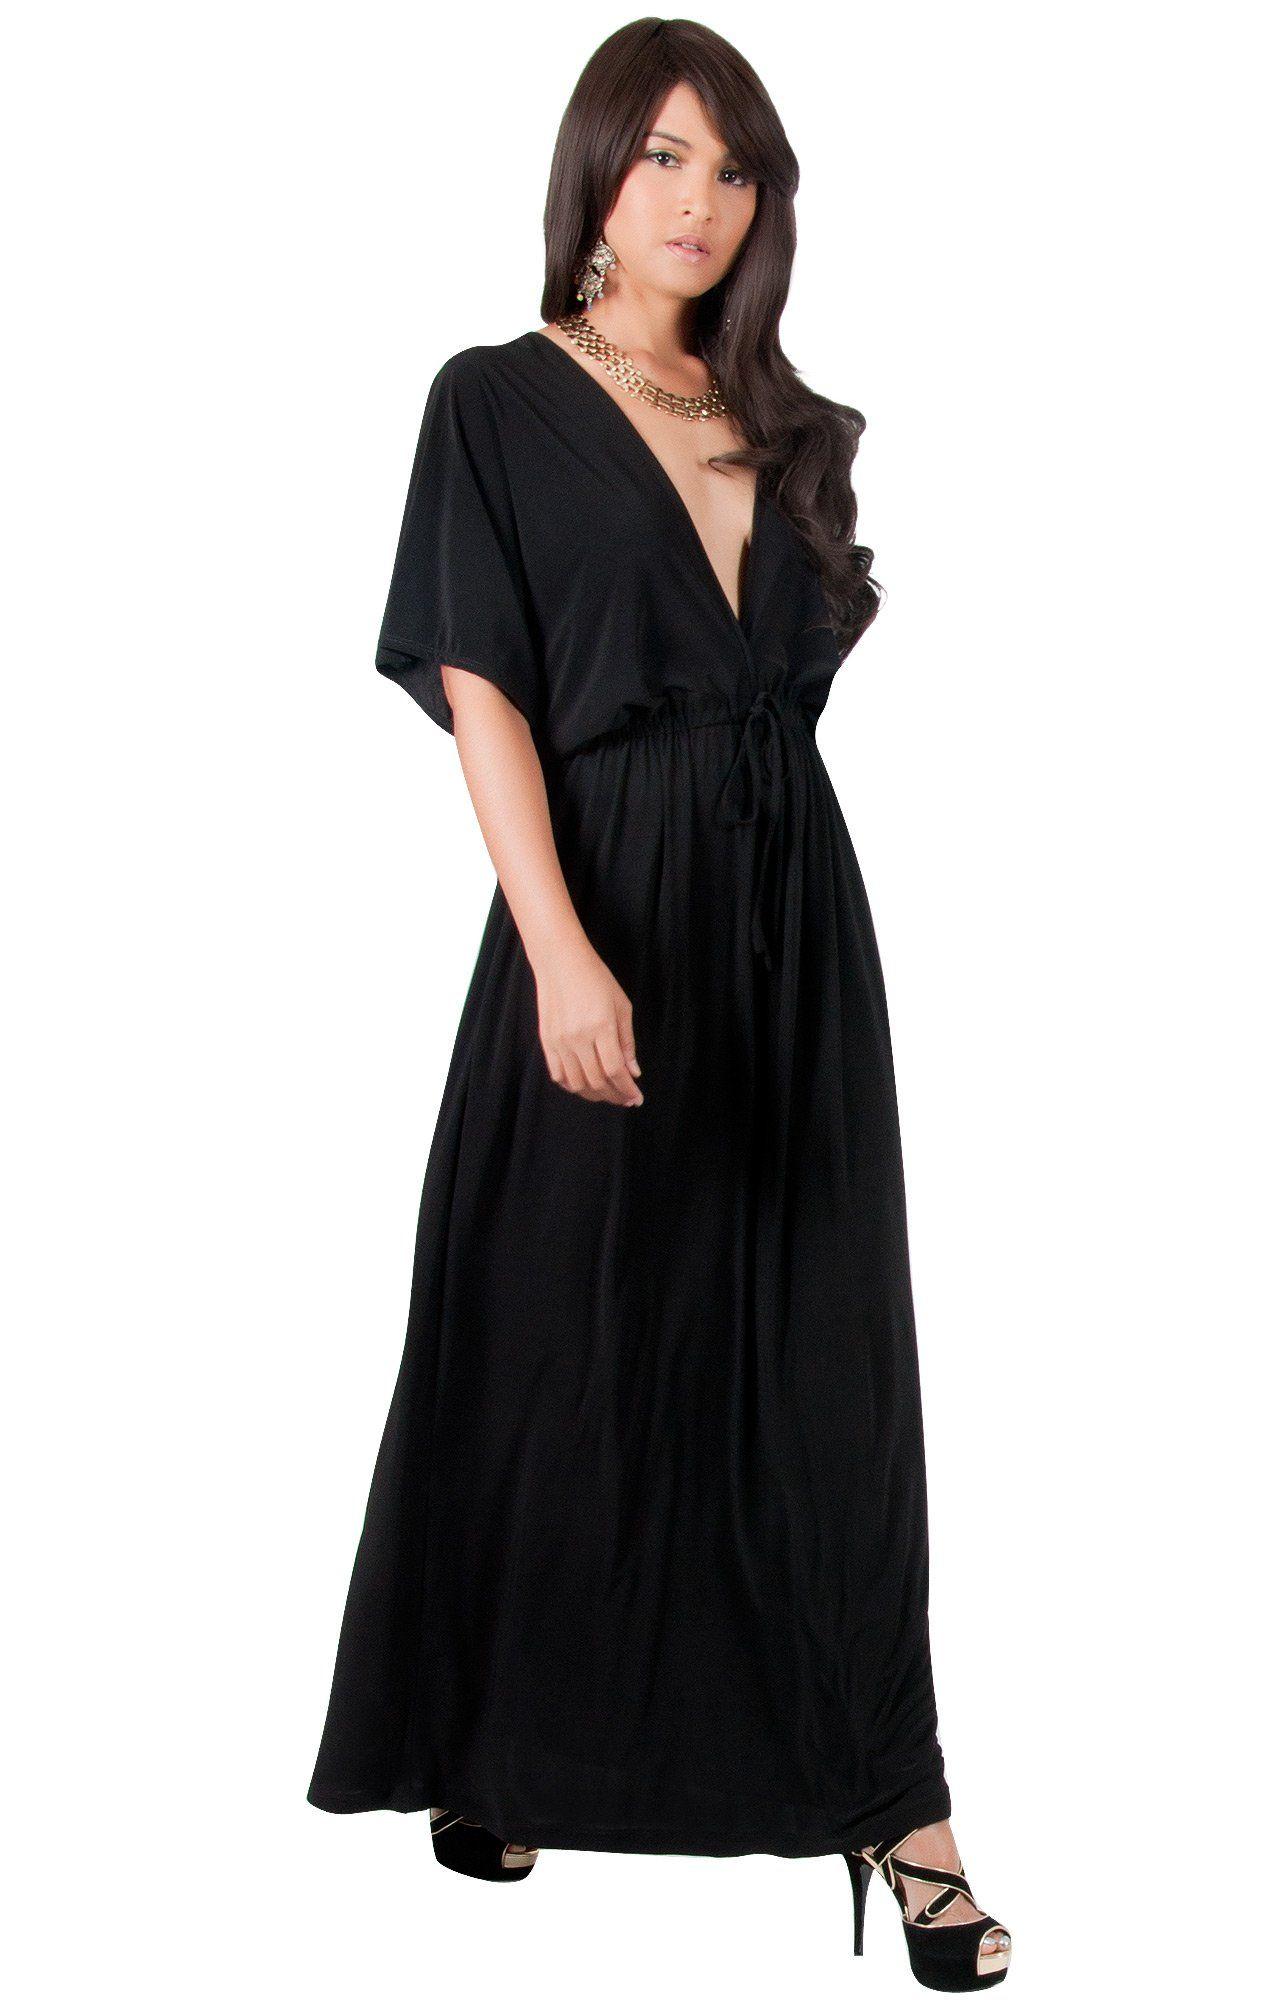 a0948309526a Maternity Outfits - baggy maternity maxi dress   KOH KOH Plus Size Womens  Long Sexy Kimono